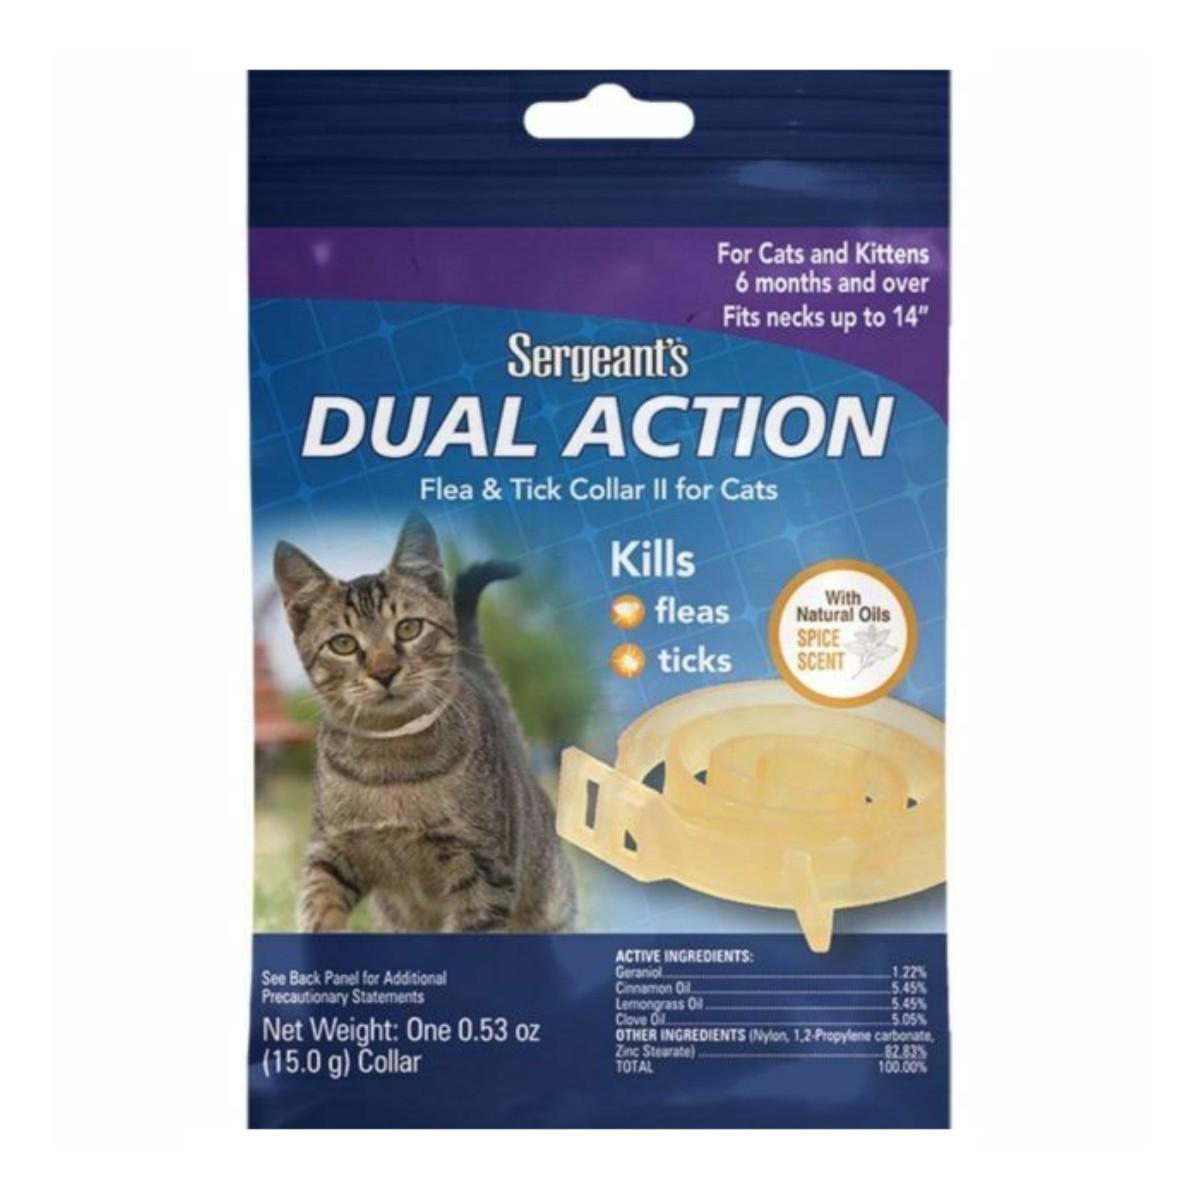 Sergeant's Dual Action Flea & Tick Collar II for Cats